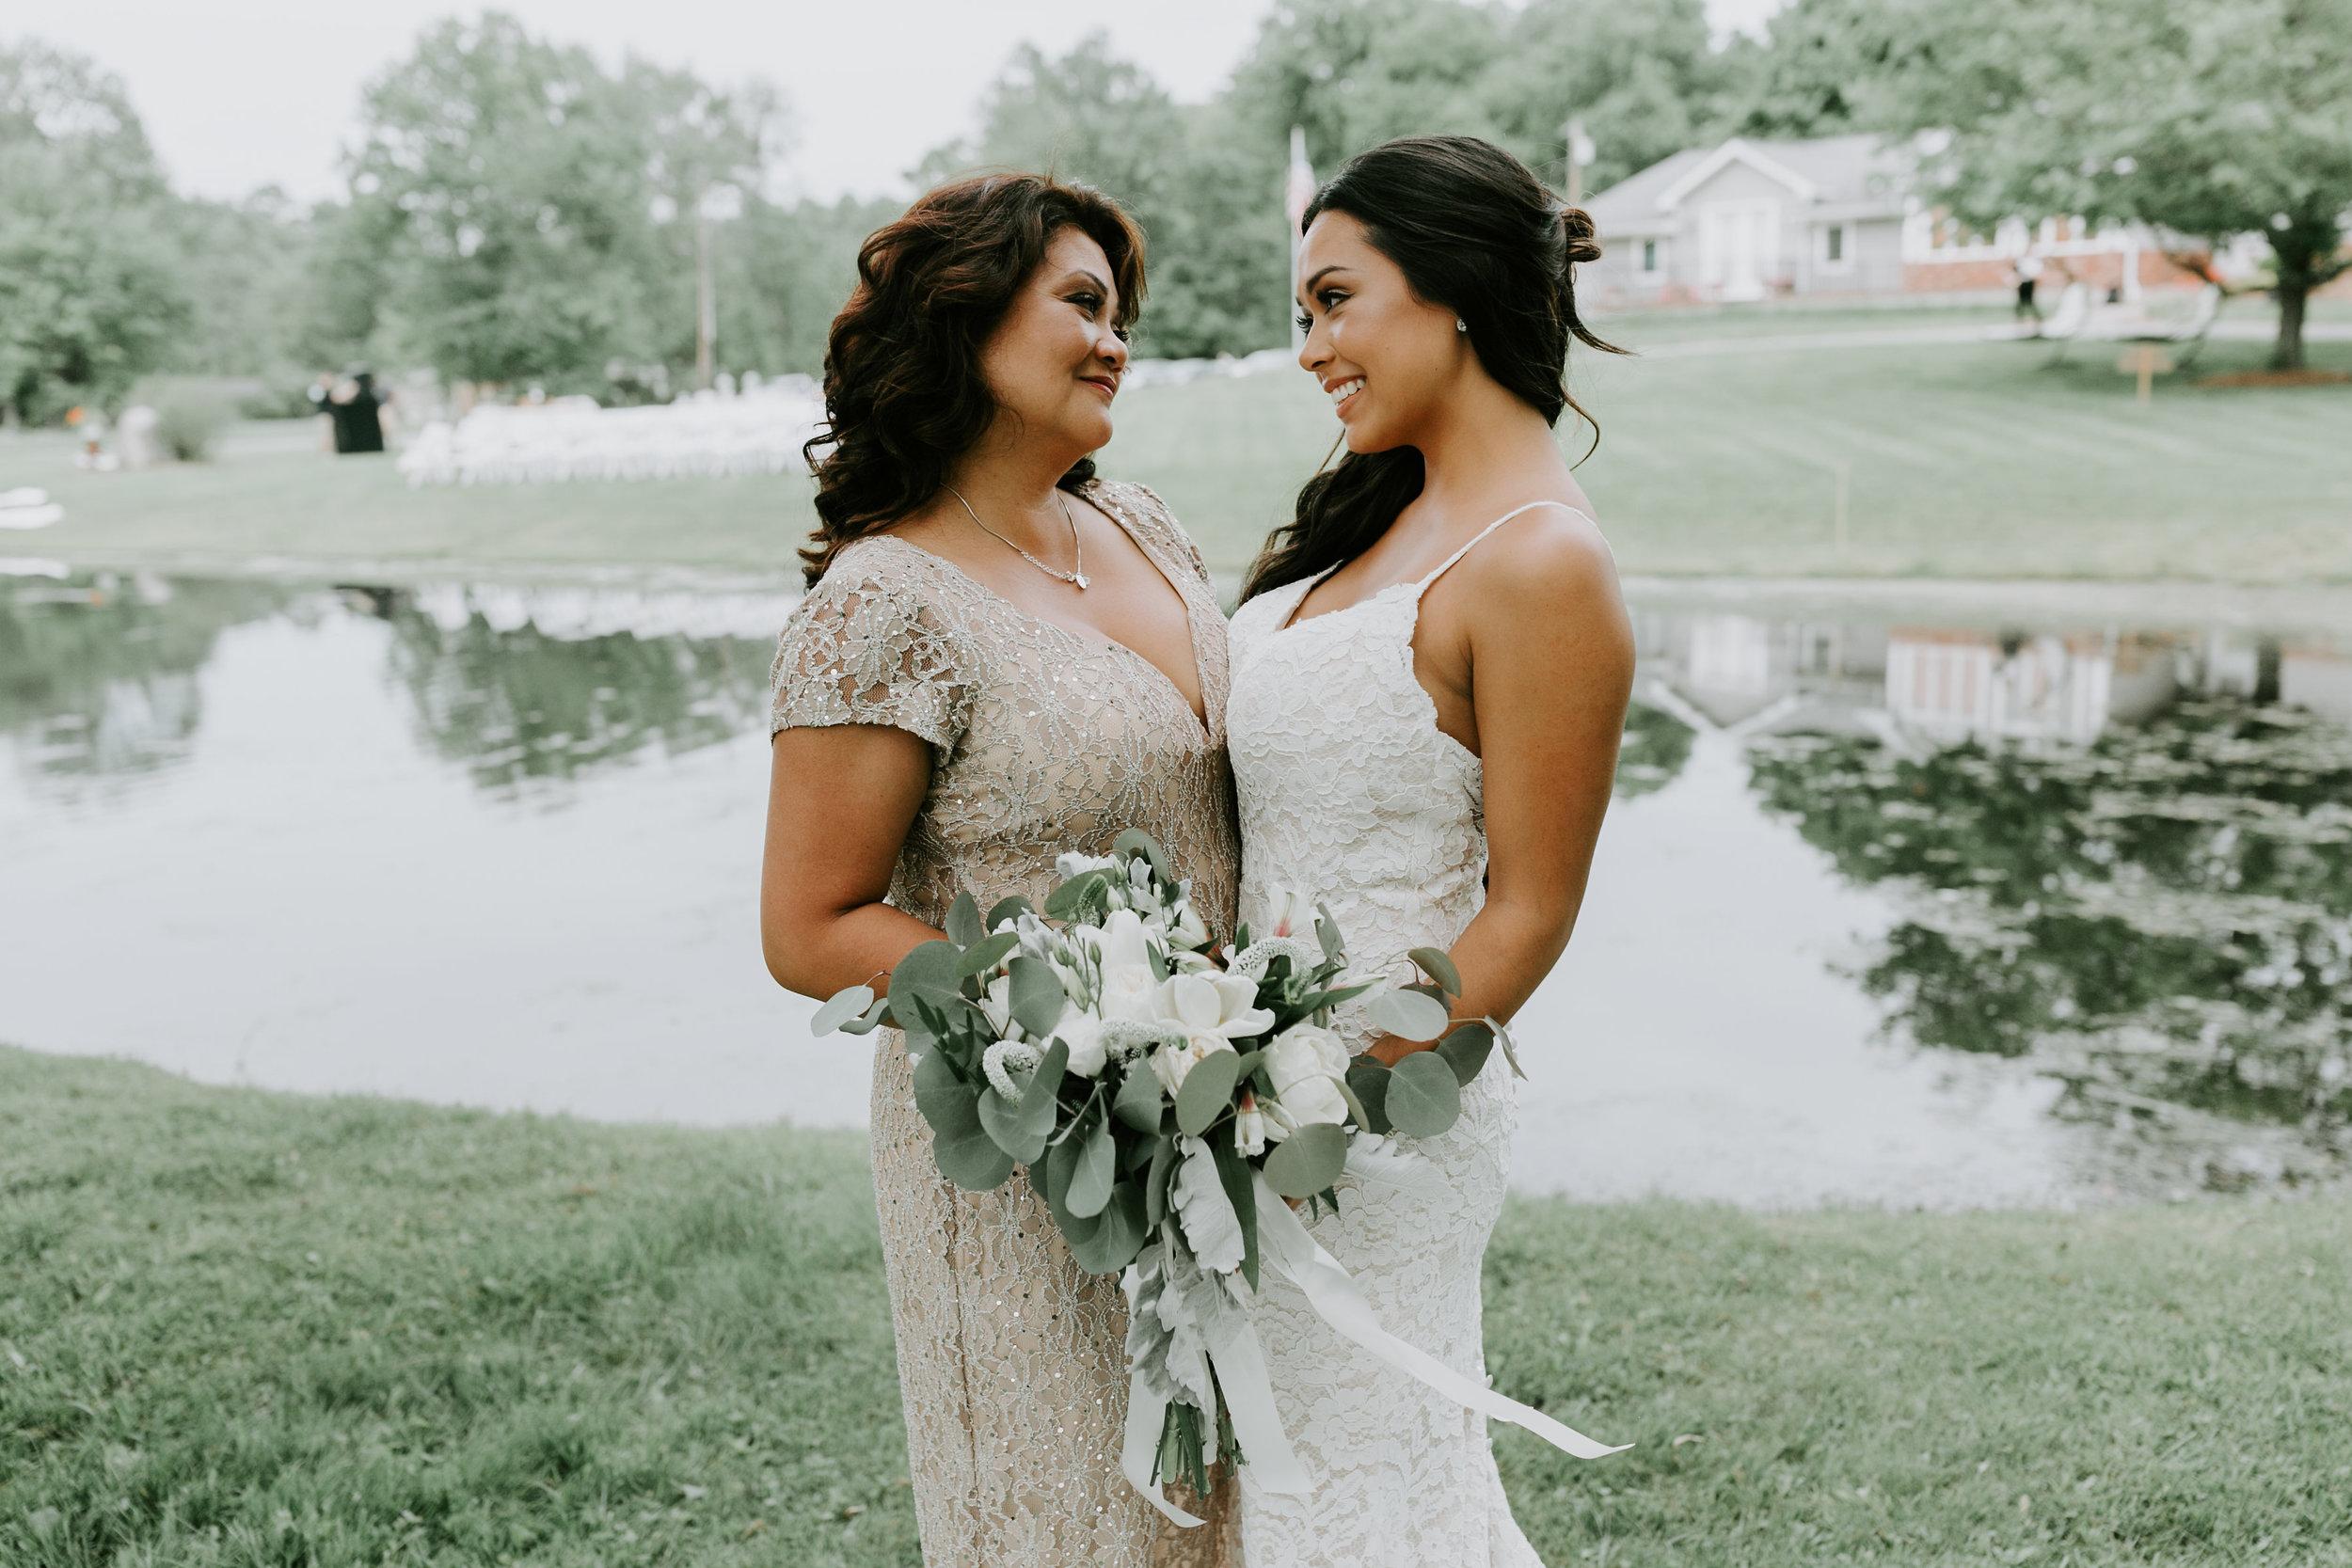 hudson valley wedding planner26.jpg